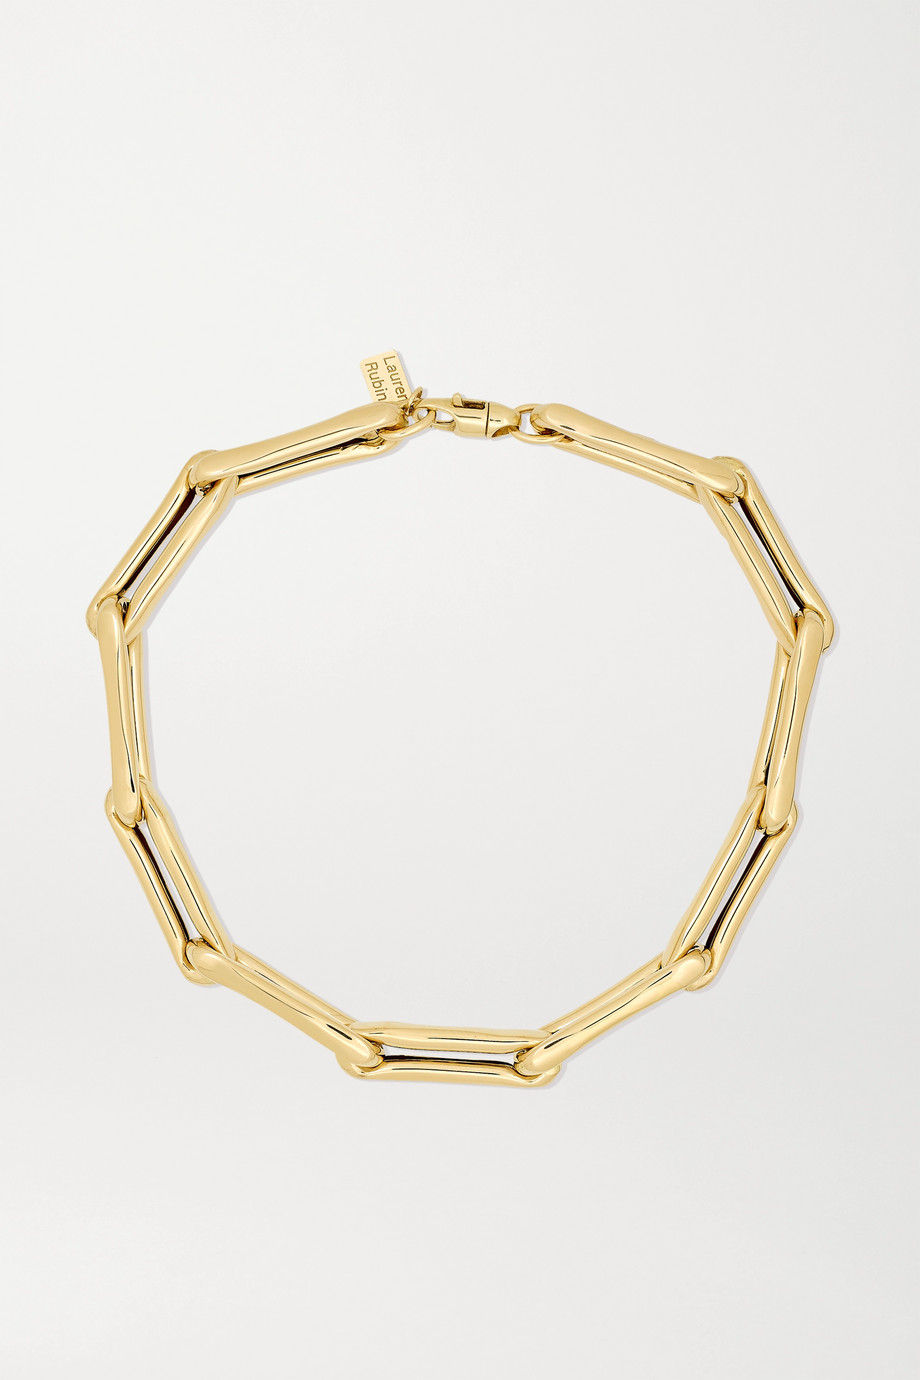 Lauren Rubinski Extra Large 14-karat gold necklace